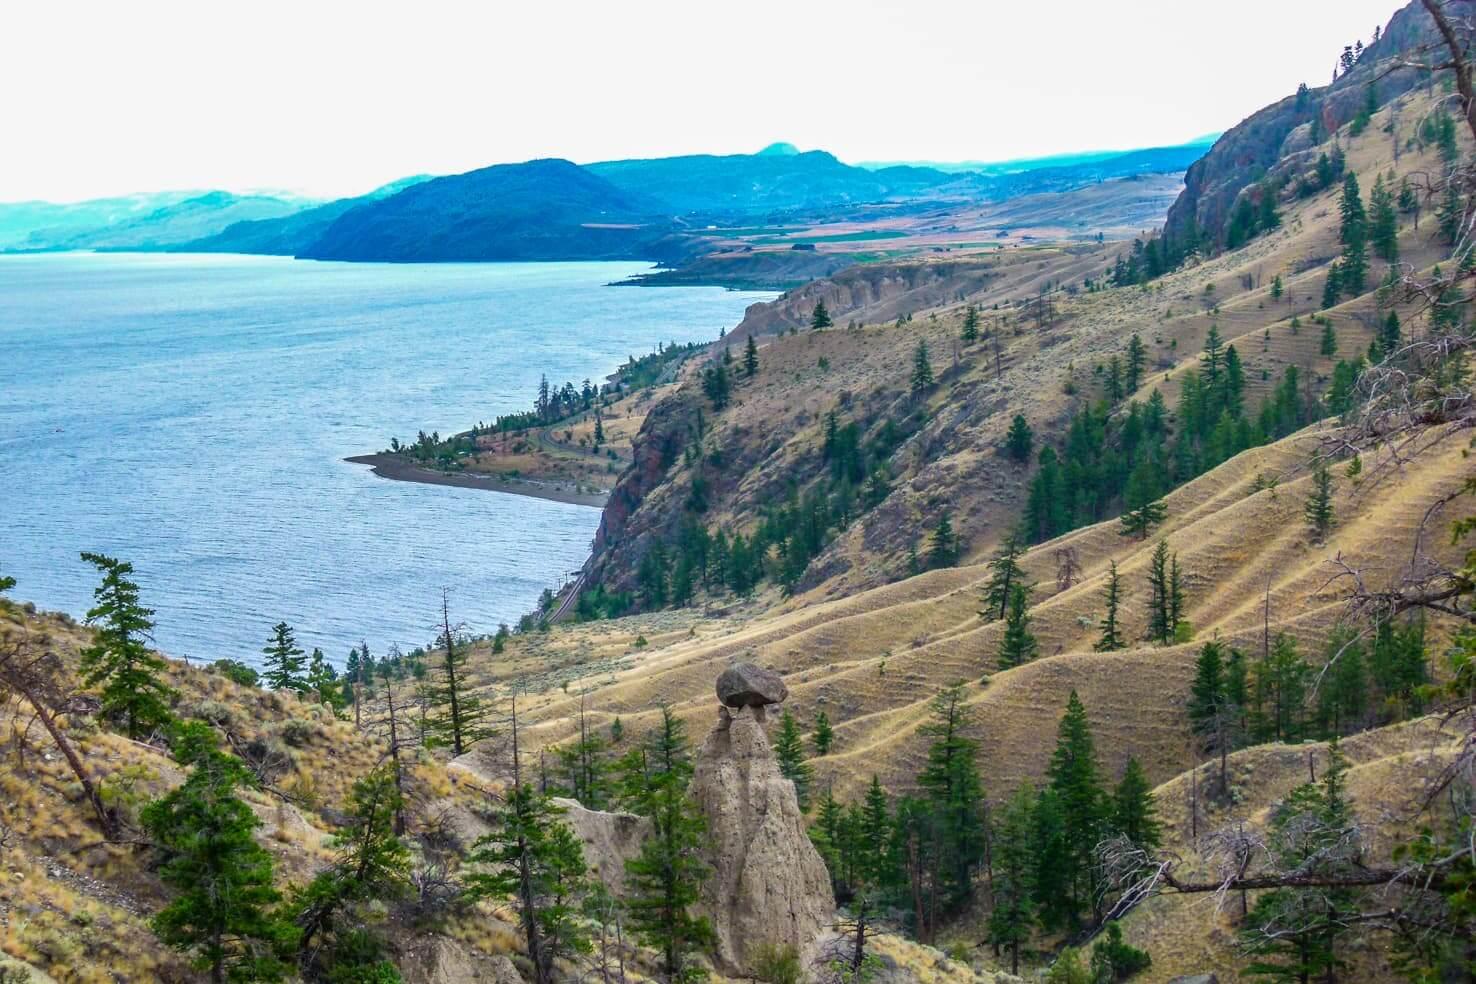 Western Canada road trip from Calgary to Vancouver - Balancing Rock in Kamloops